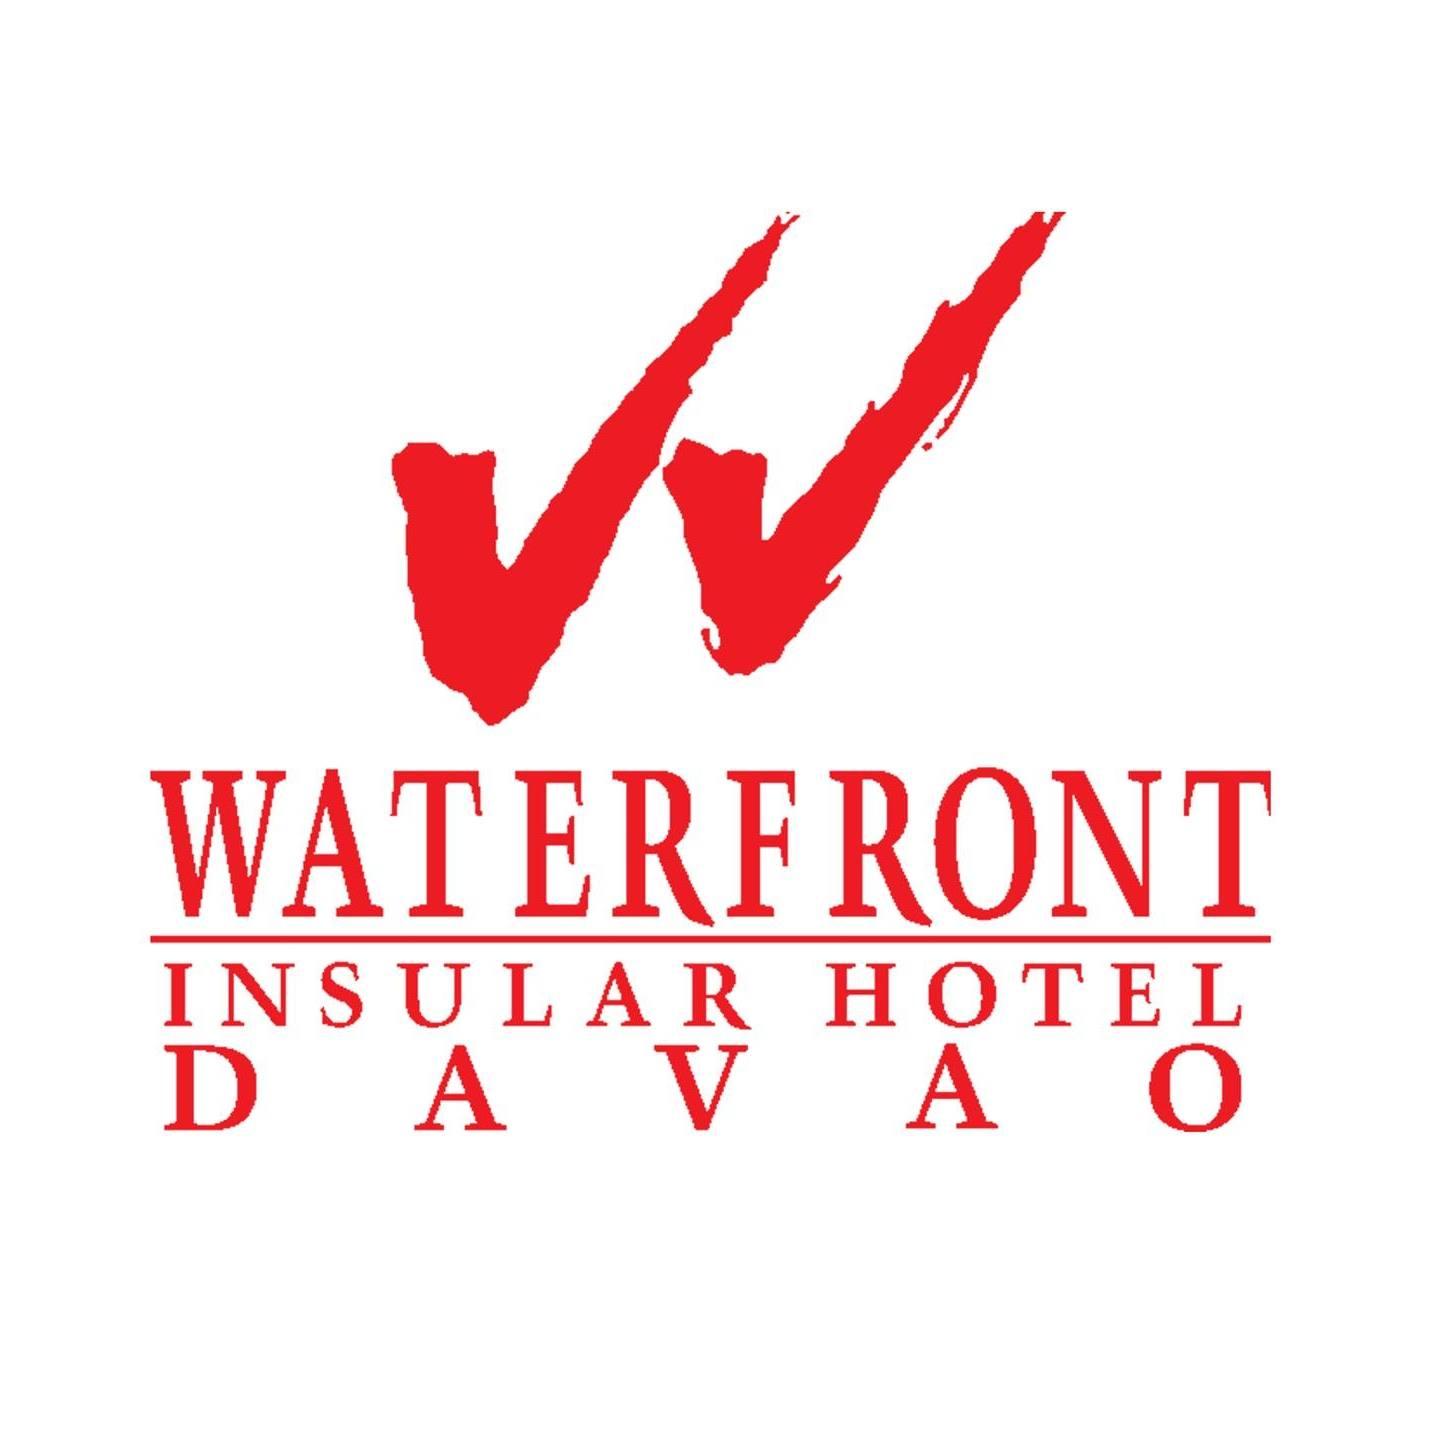 Waterfront Insular Hotel Davao 1 profile